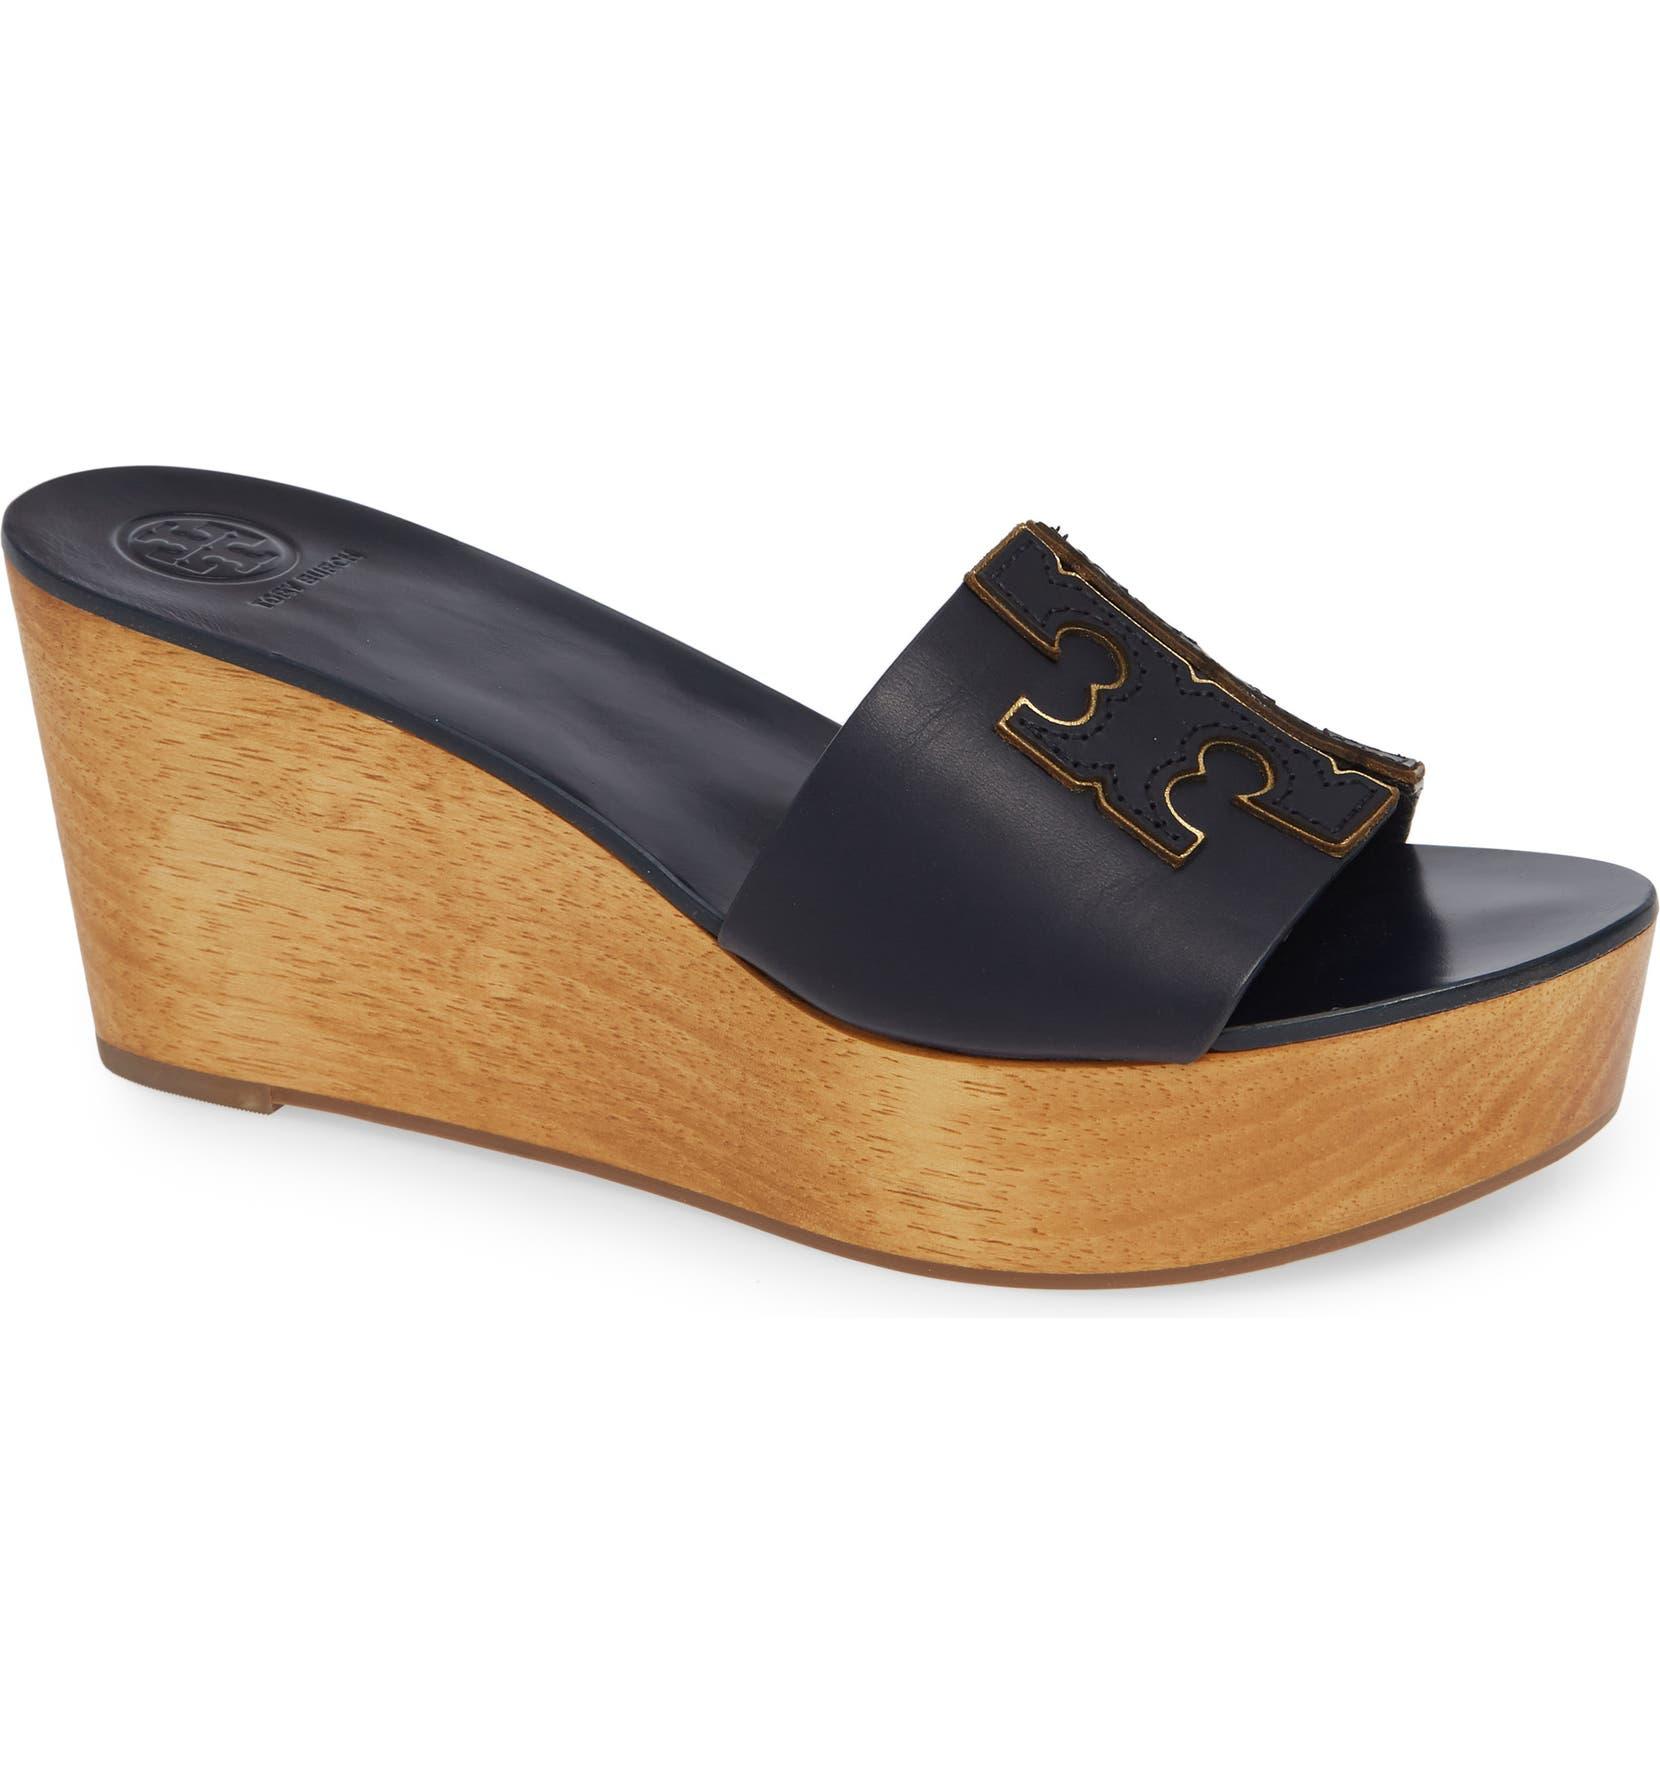 1d3fca149 Tory Burch Ines Wedge Slide Sandal (Women)